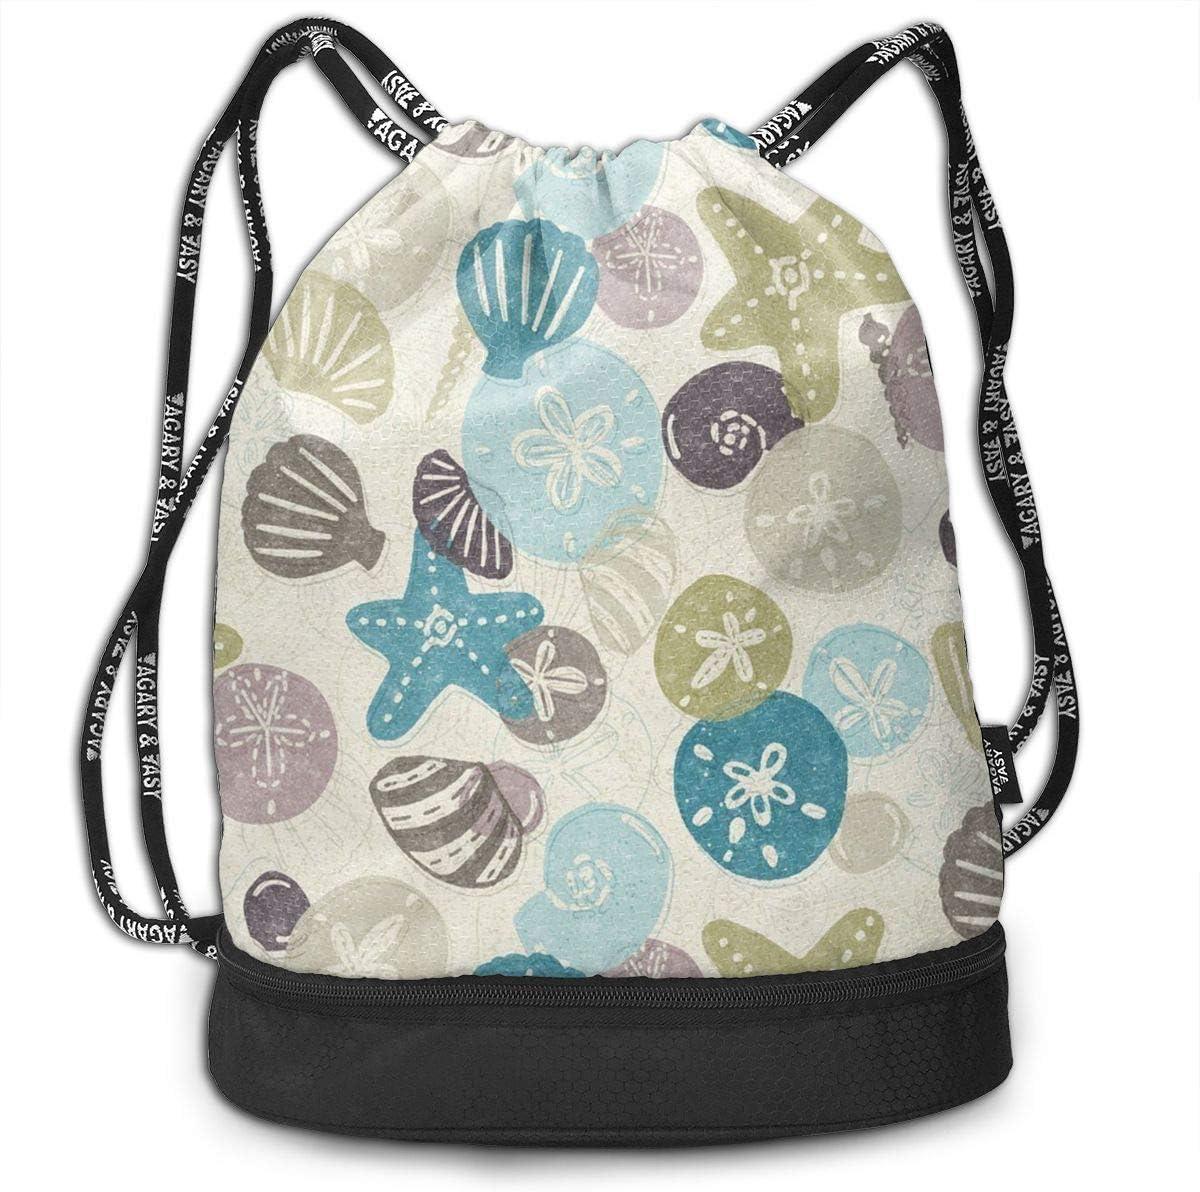 HUOPR5Q Starry Galaxy Drawstring Backpack Sport Gym Sack Shoulder Bulk Bag Dance Bag for School Travel